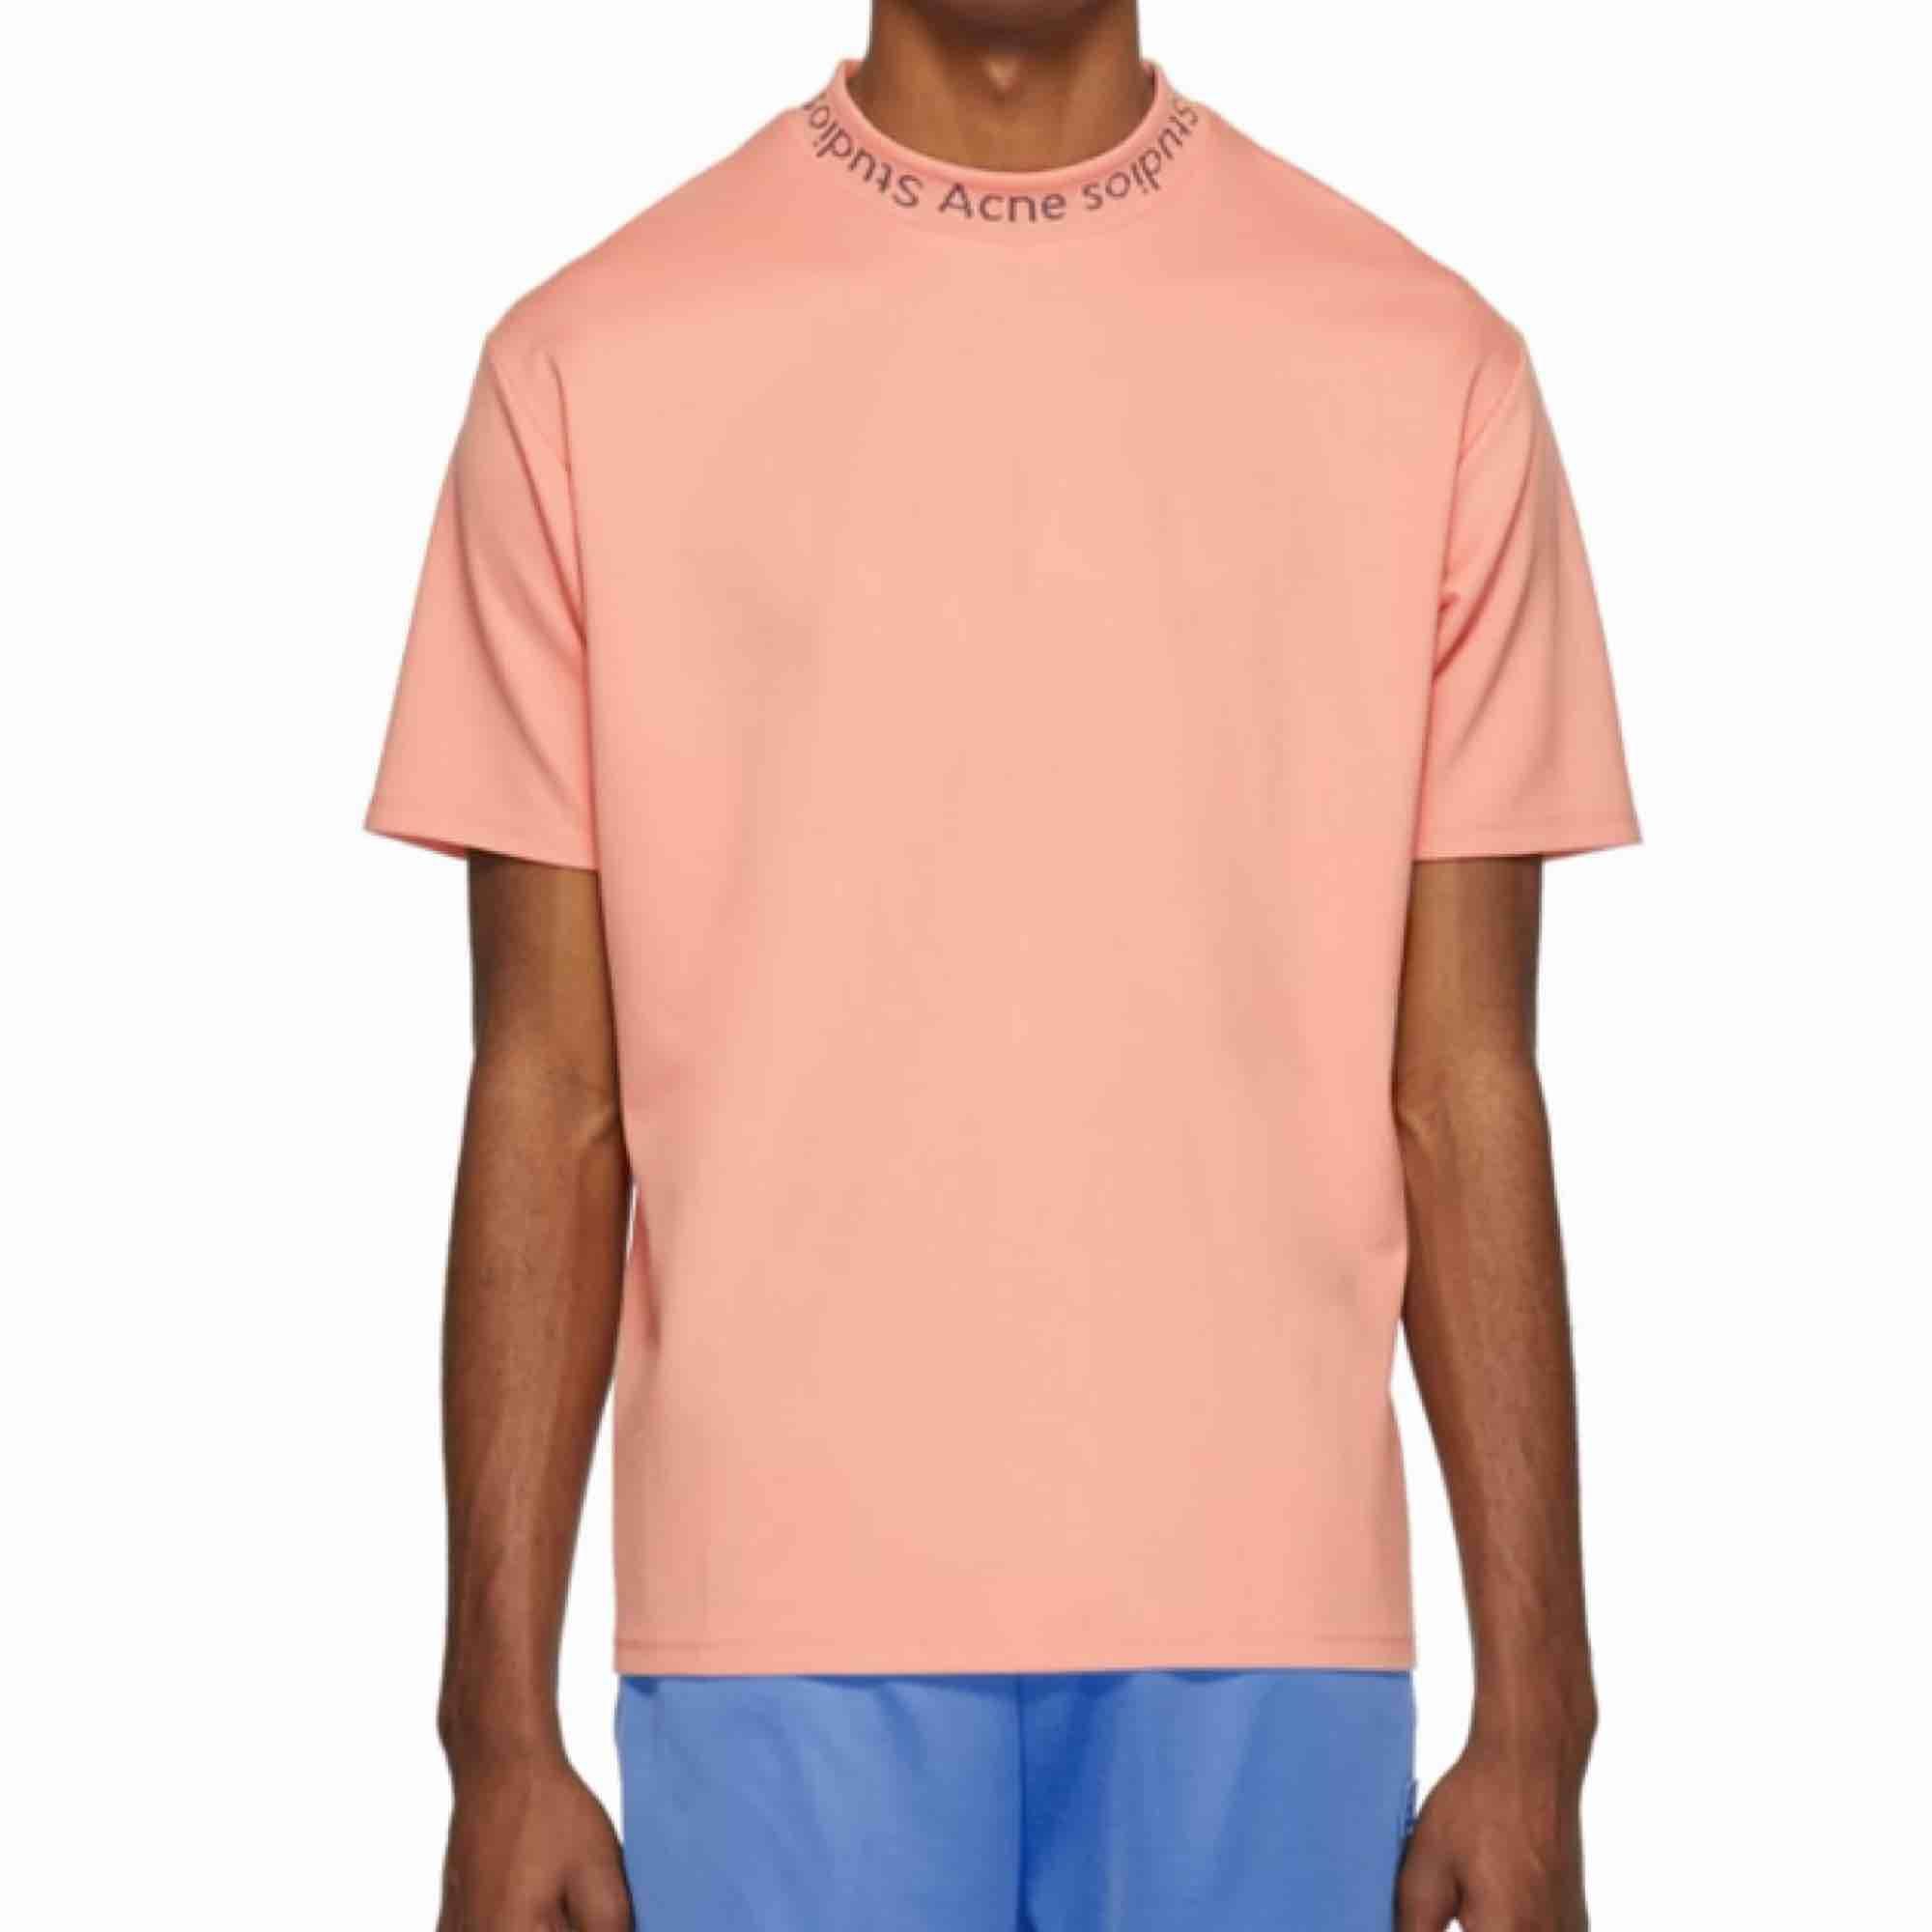 Acne studios t-shirt Rosa storlek S (men lite oversize). Nypris 1400:-. T-shirts.